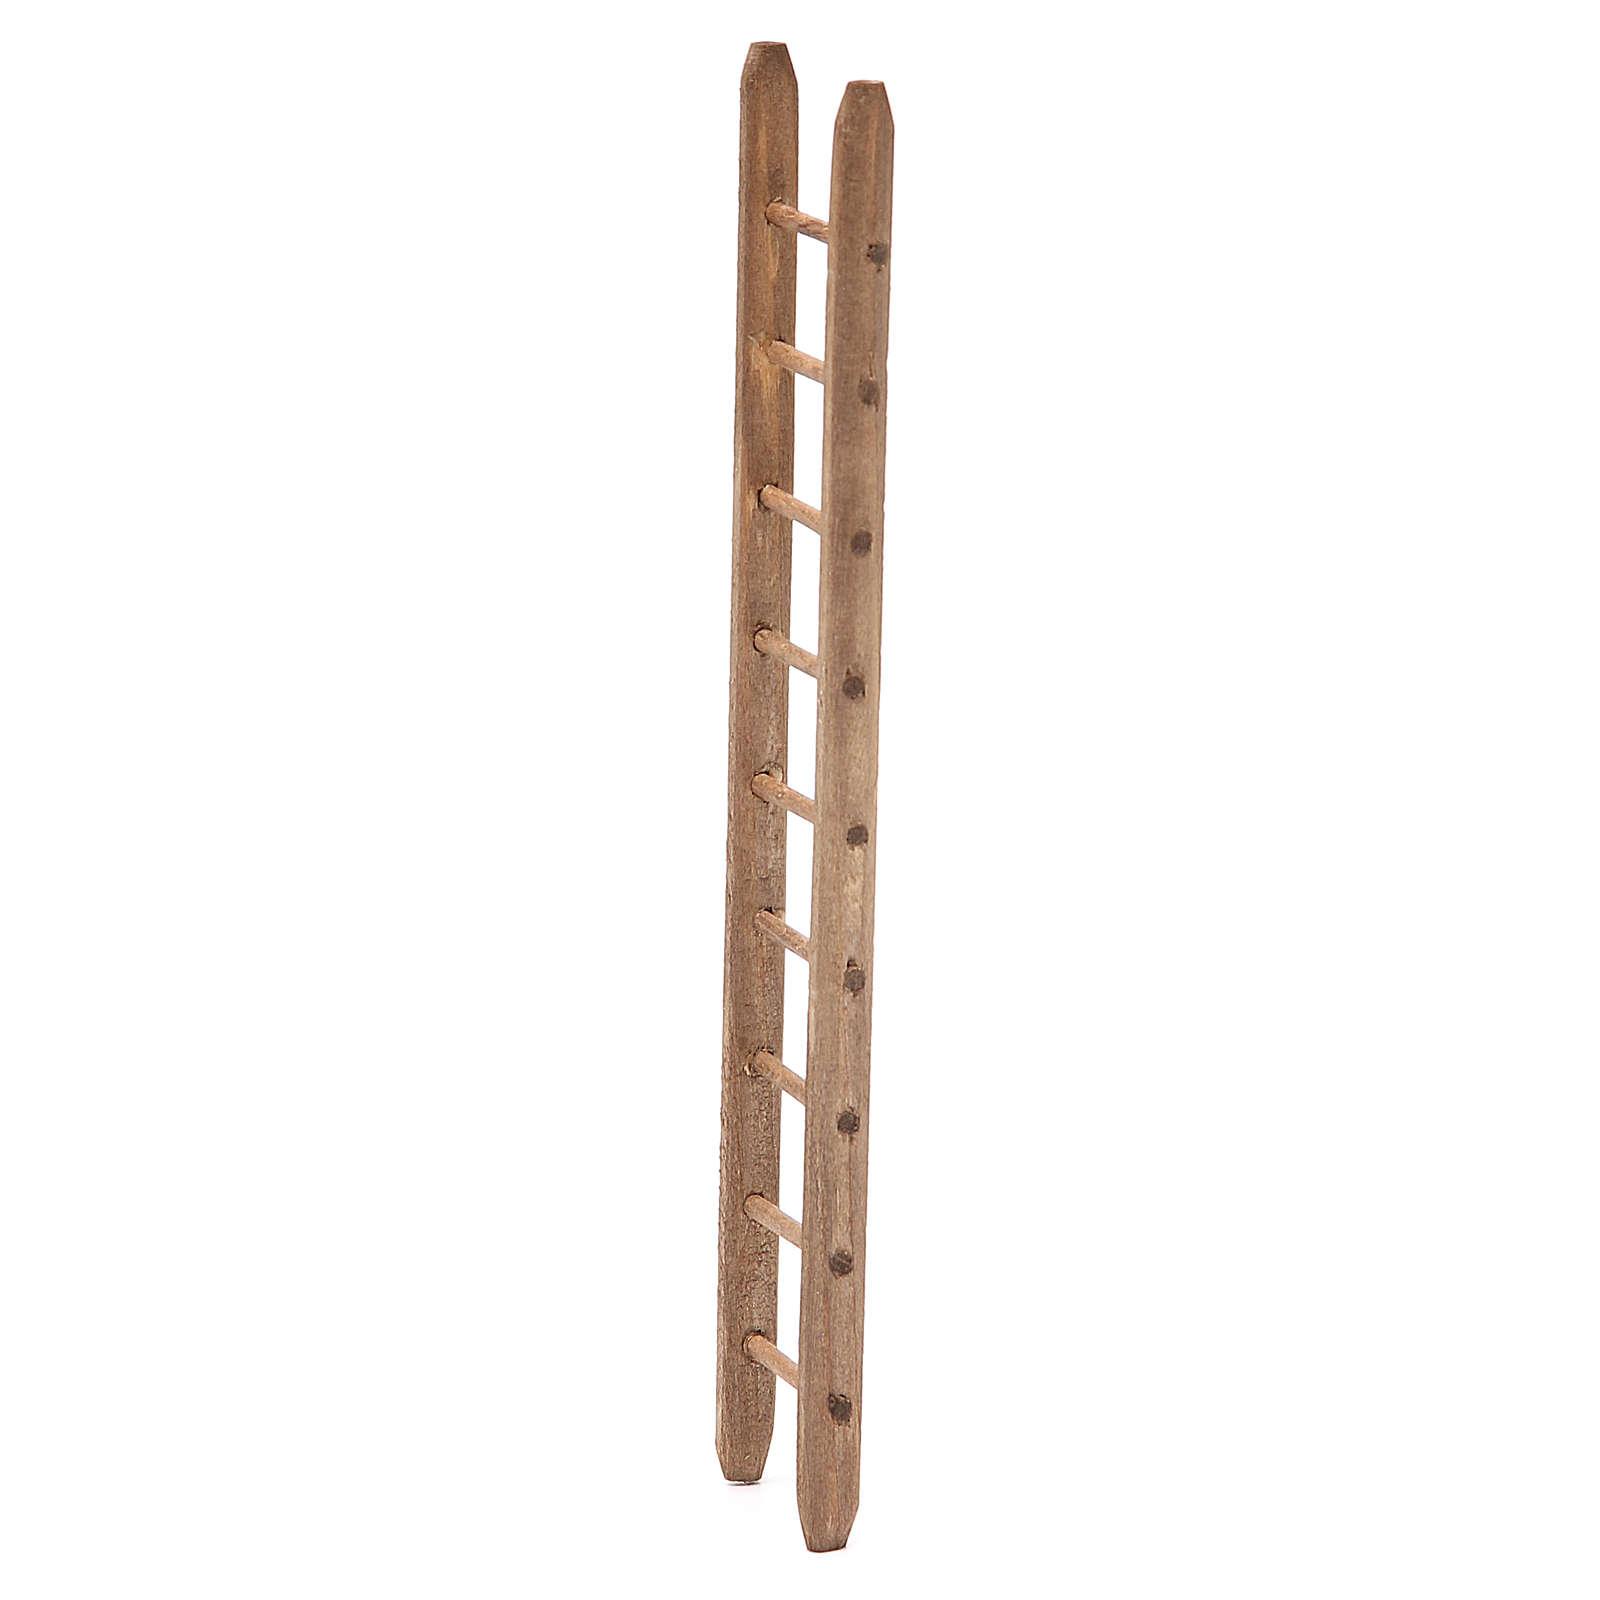 Scala in legno scuro per presepe h. 18x4 cm 4